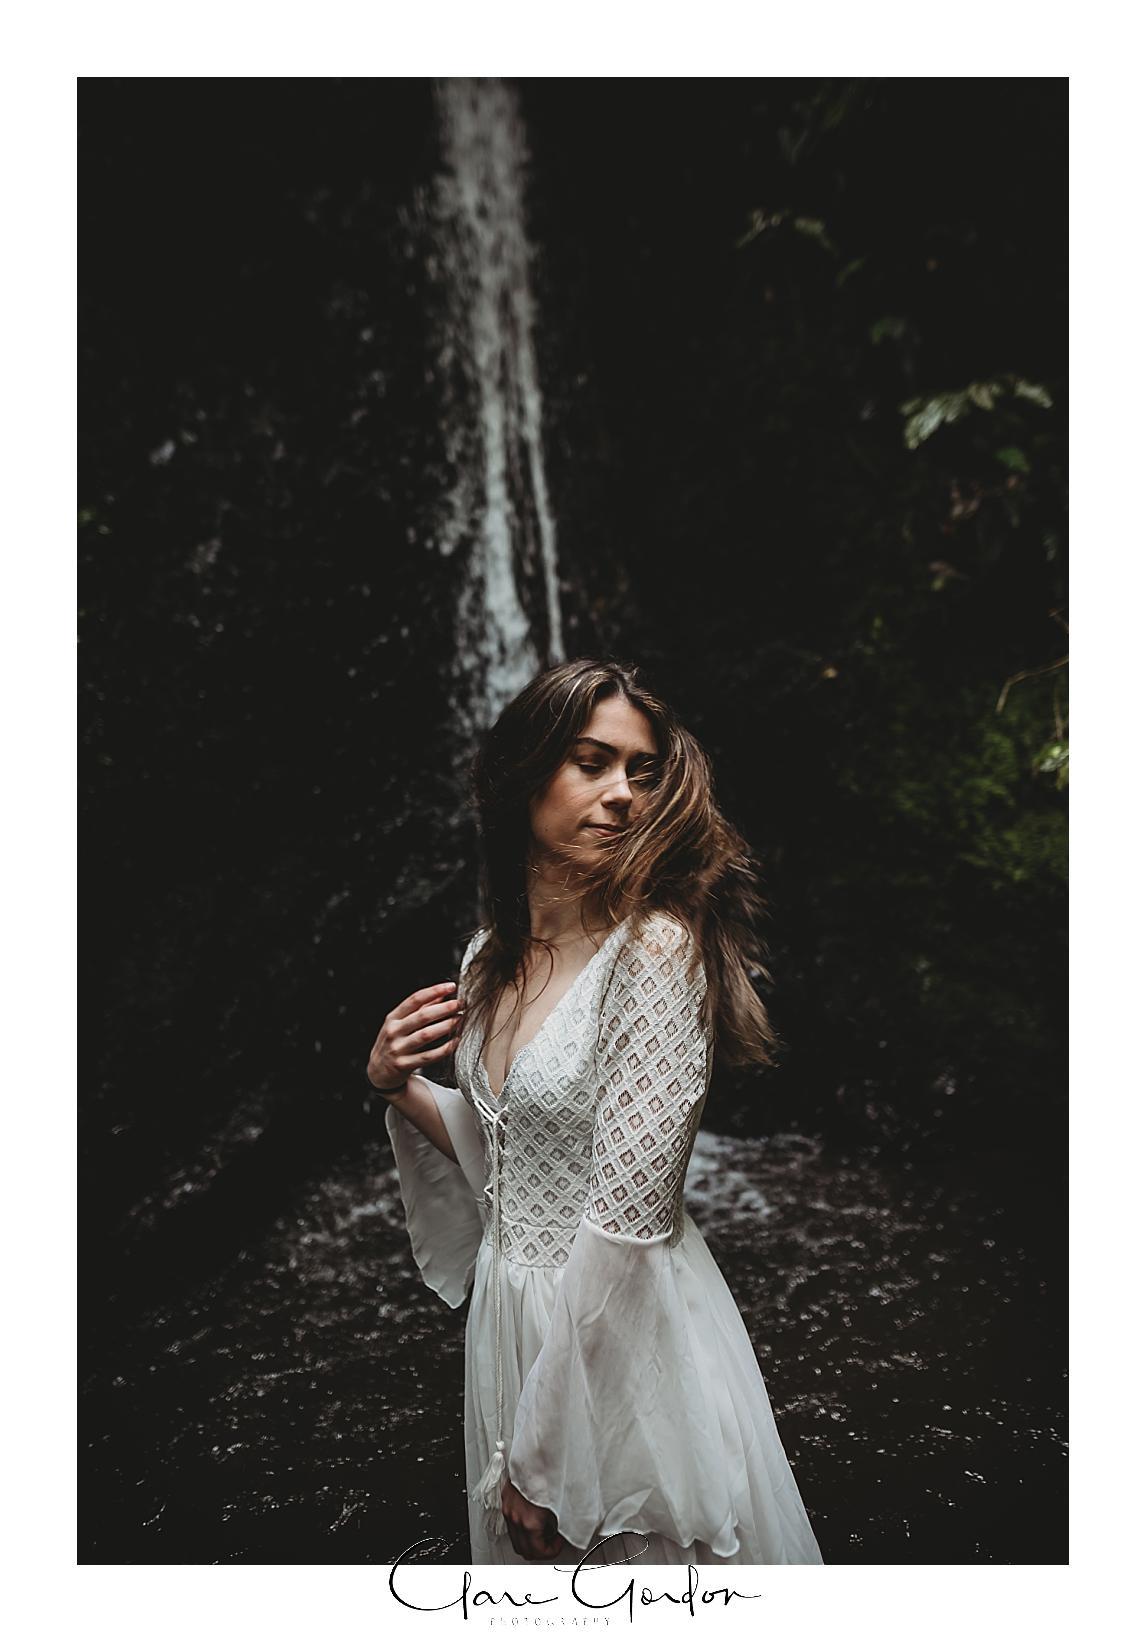 boho-bride-Shoot-Waikato-Wedding-photography-Girl-in Waterfall -New Zealand-wedding (6).jpg